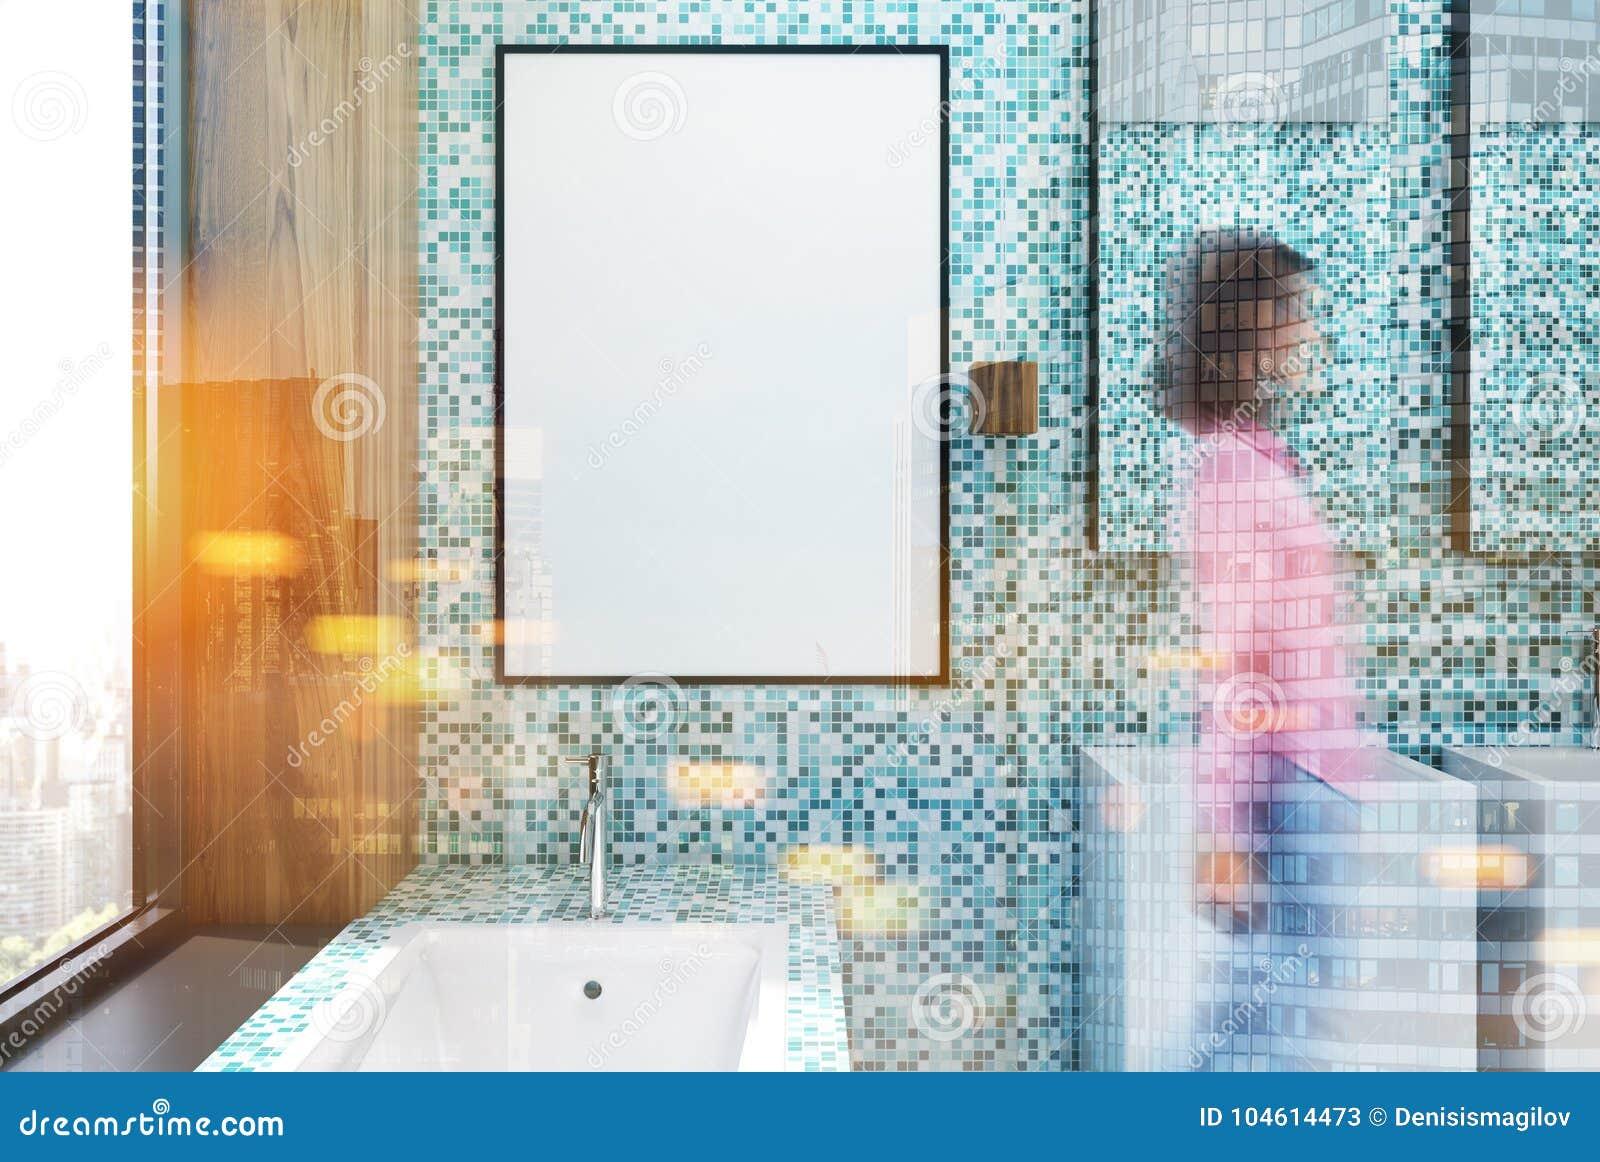 Blue Tile Bathroom Interior, Poster Toned Stock Illustration ...